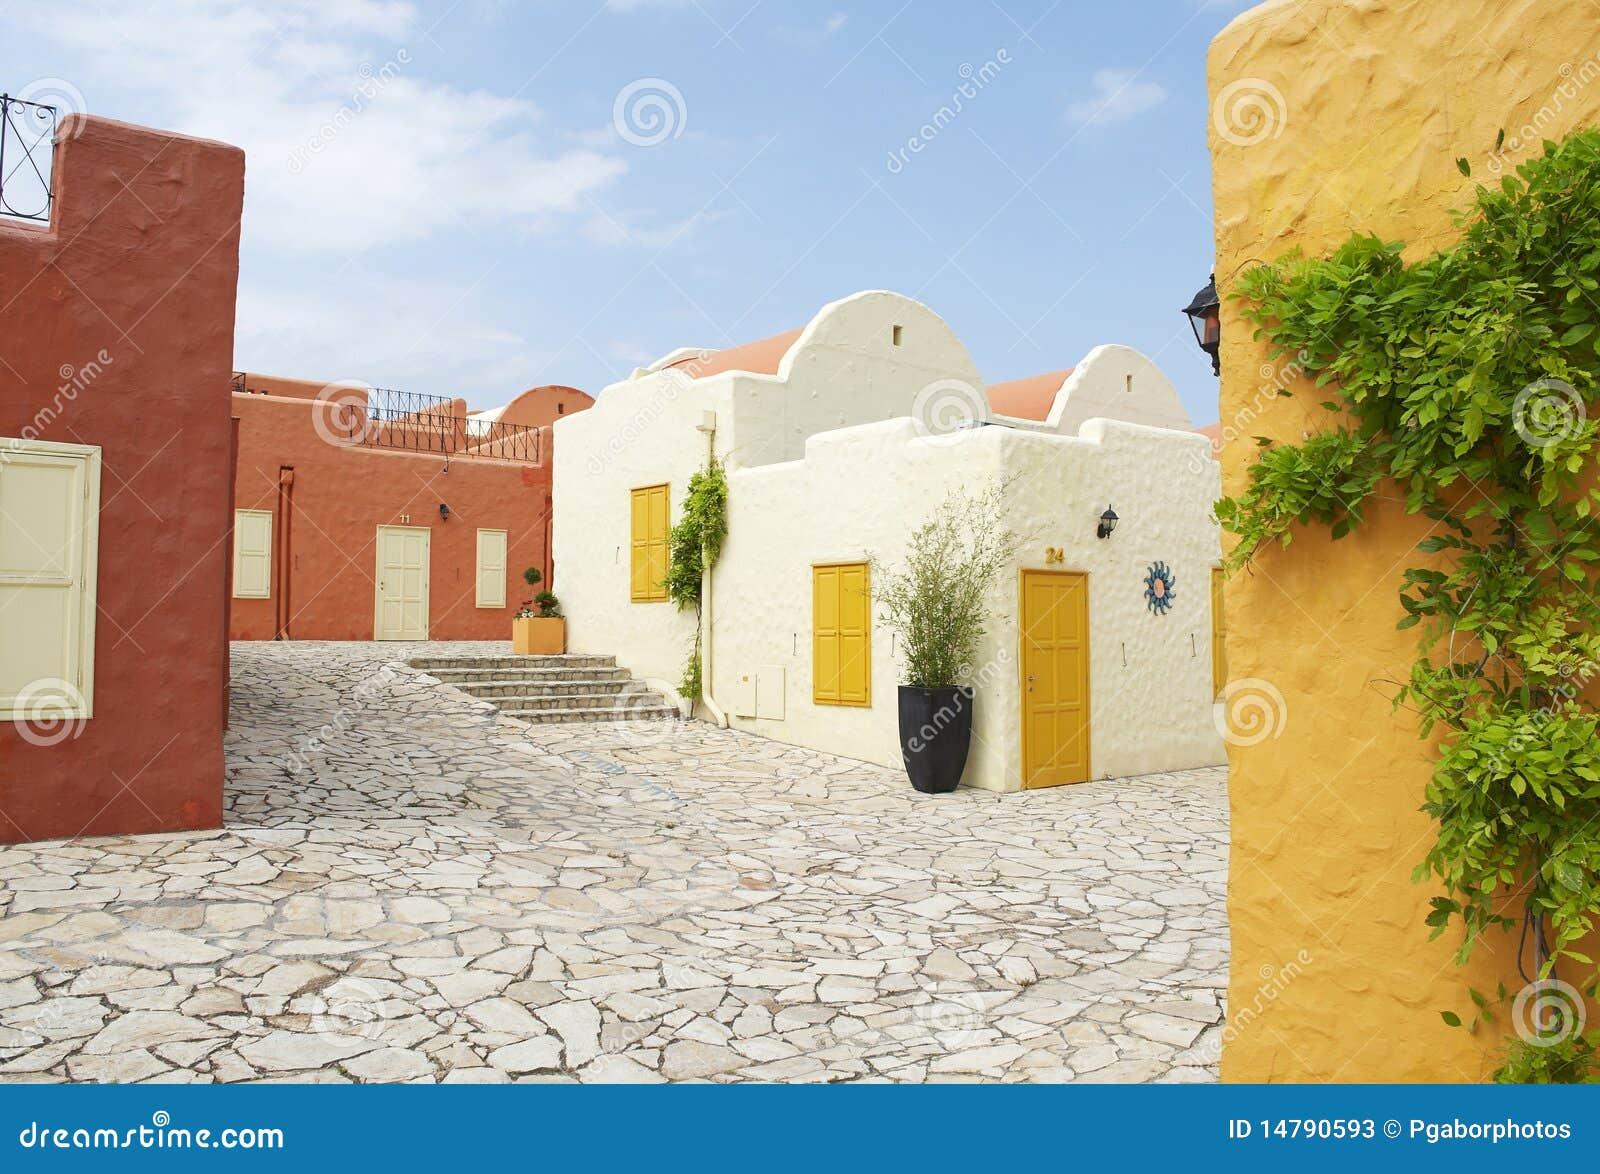 case mediterranee immagine stock immagine di front citt